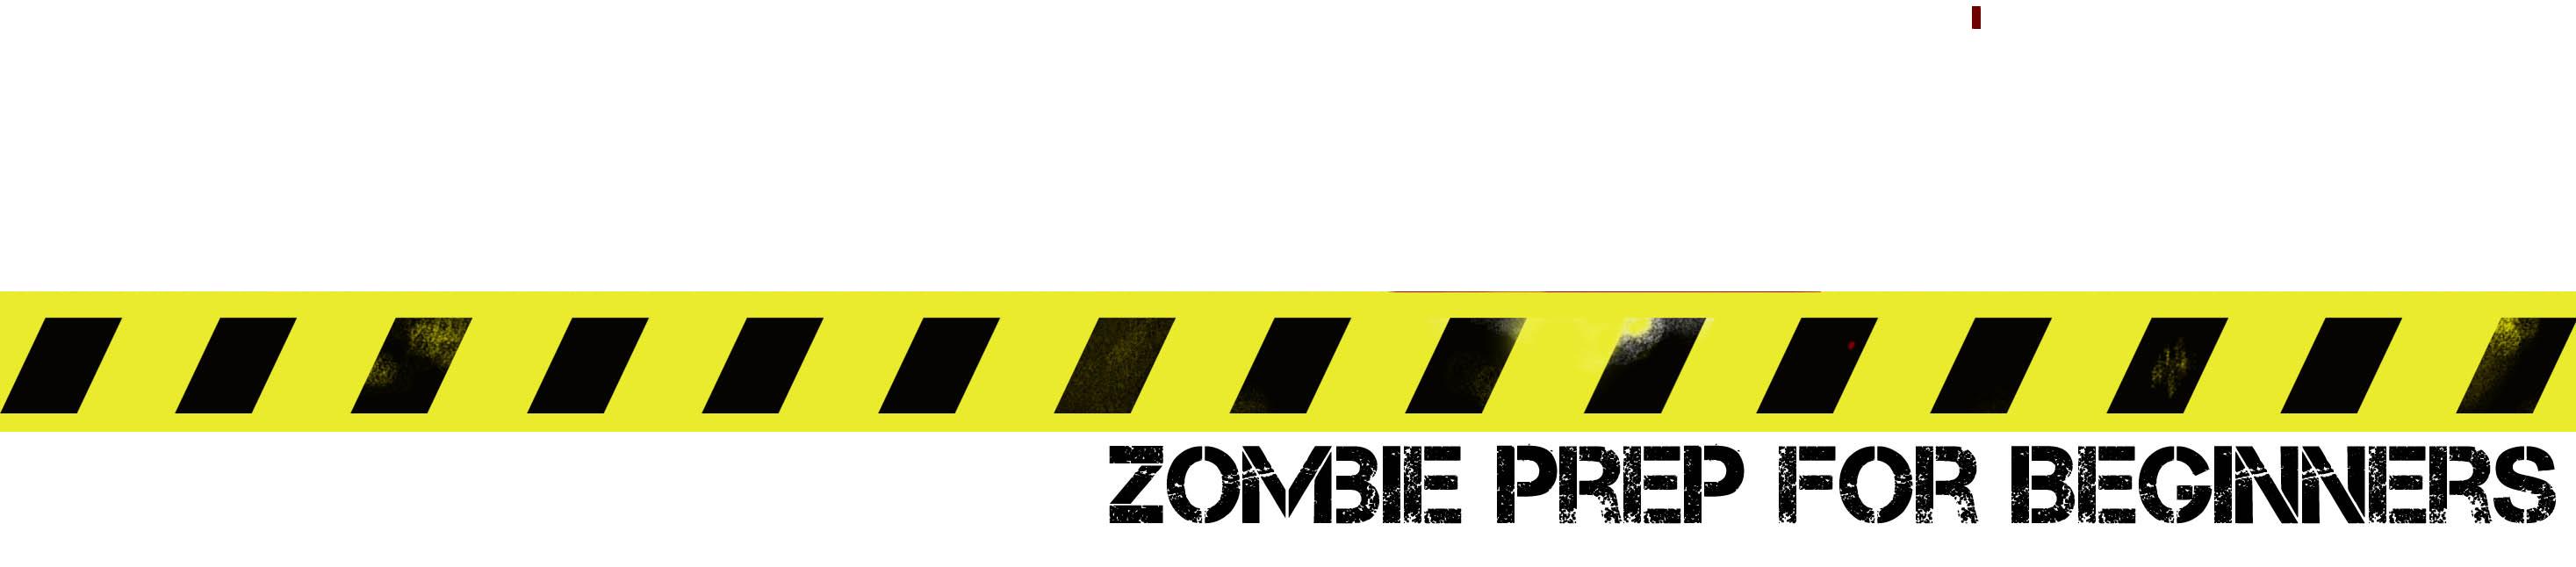 zombie apocalypse survival guide biology